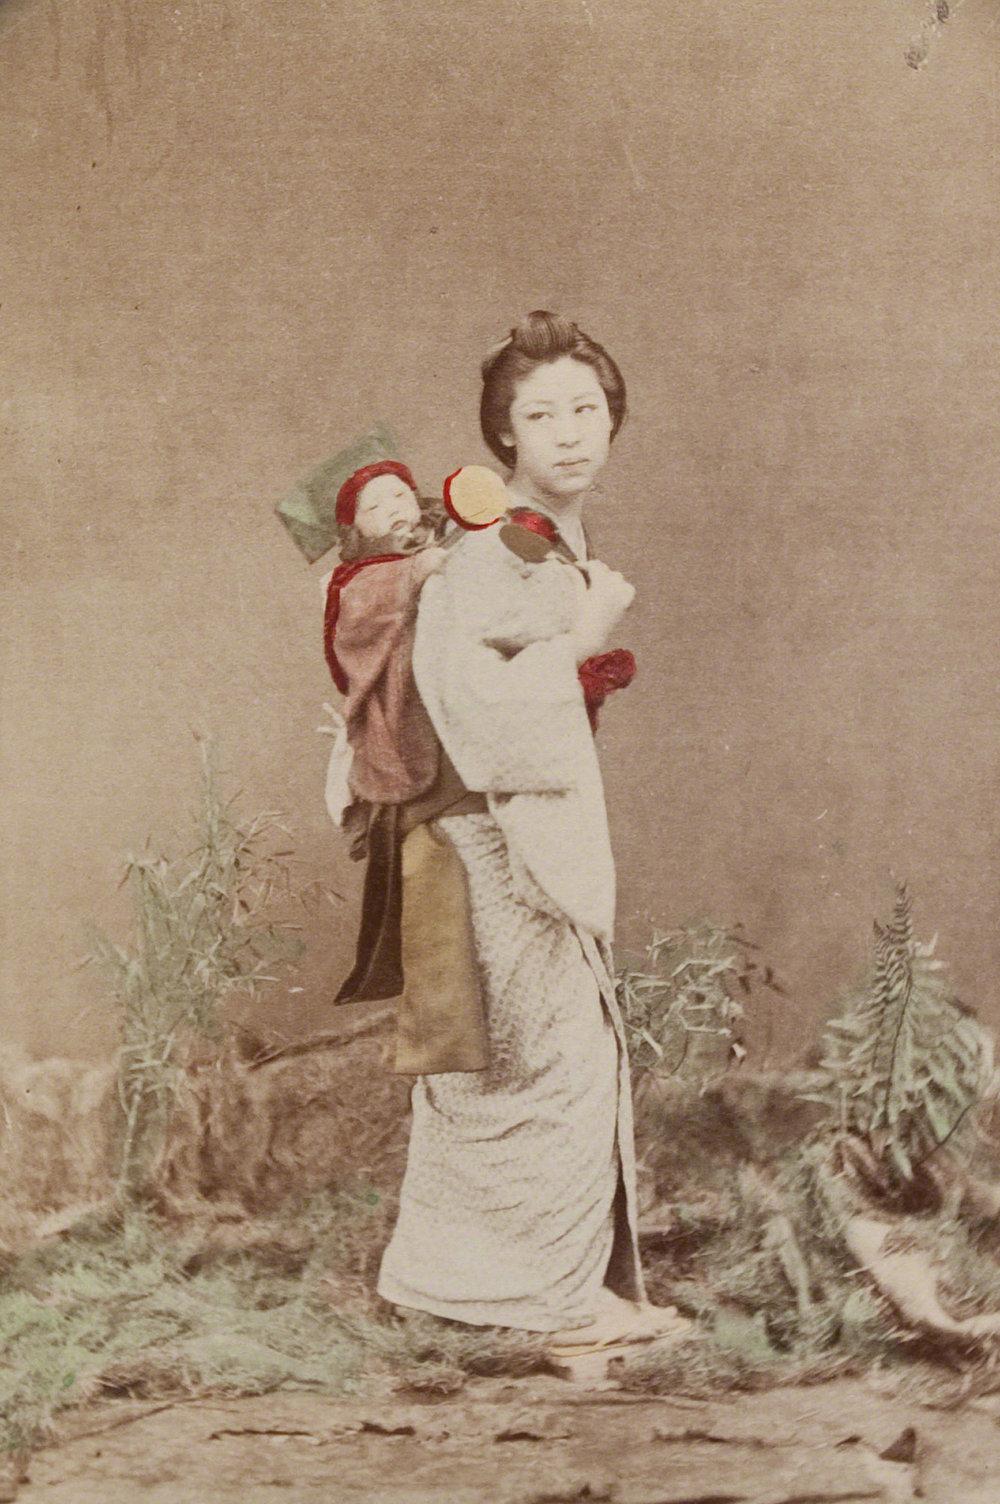 Artist: Kusakabe Kimbei (Japanese, 1841 - 1934). Albumen print.